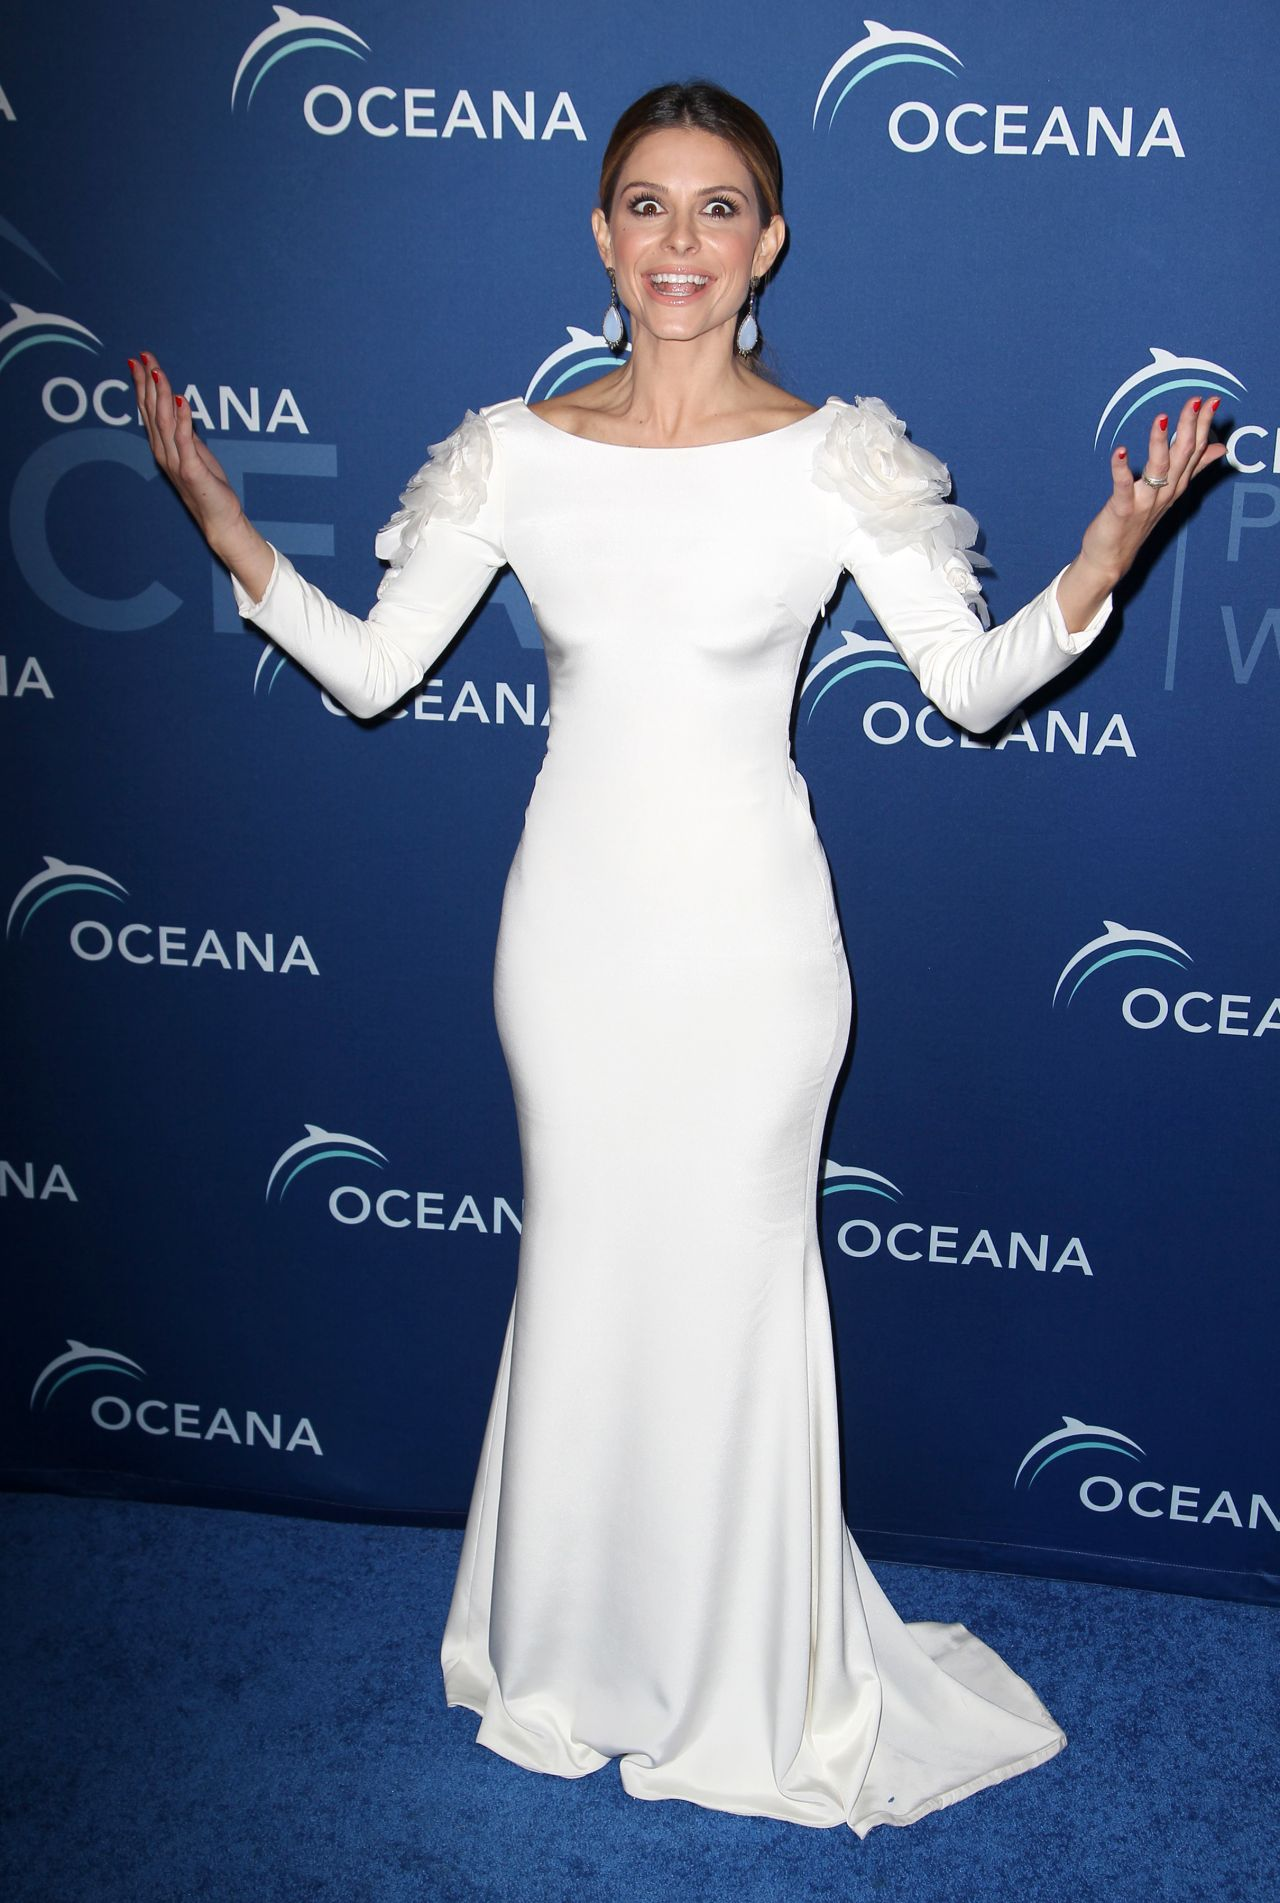 Maria Menounos at 2013 Oceana